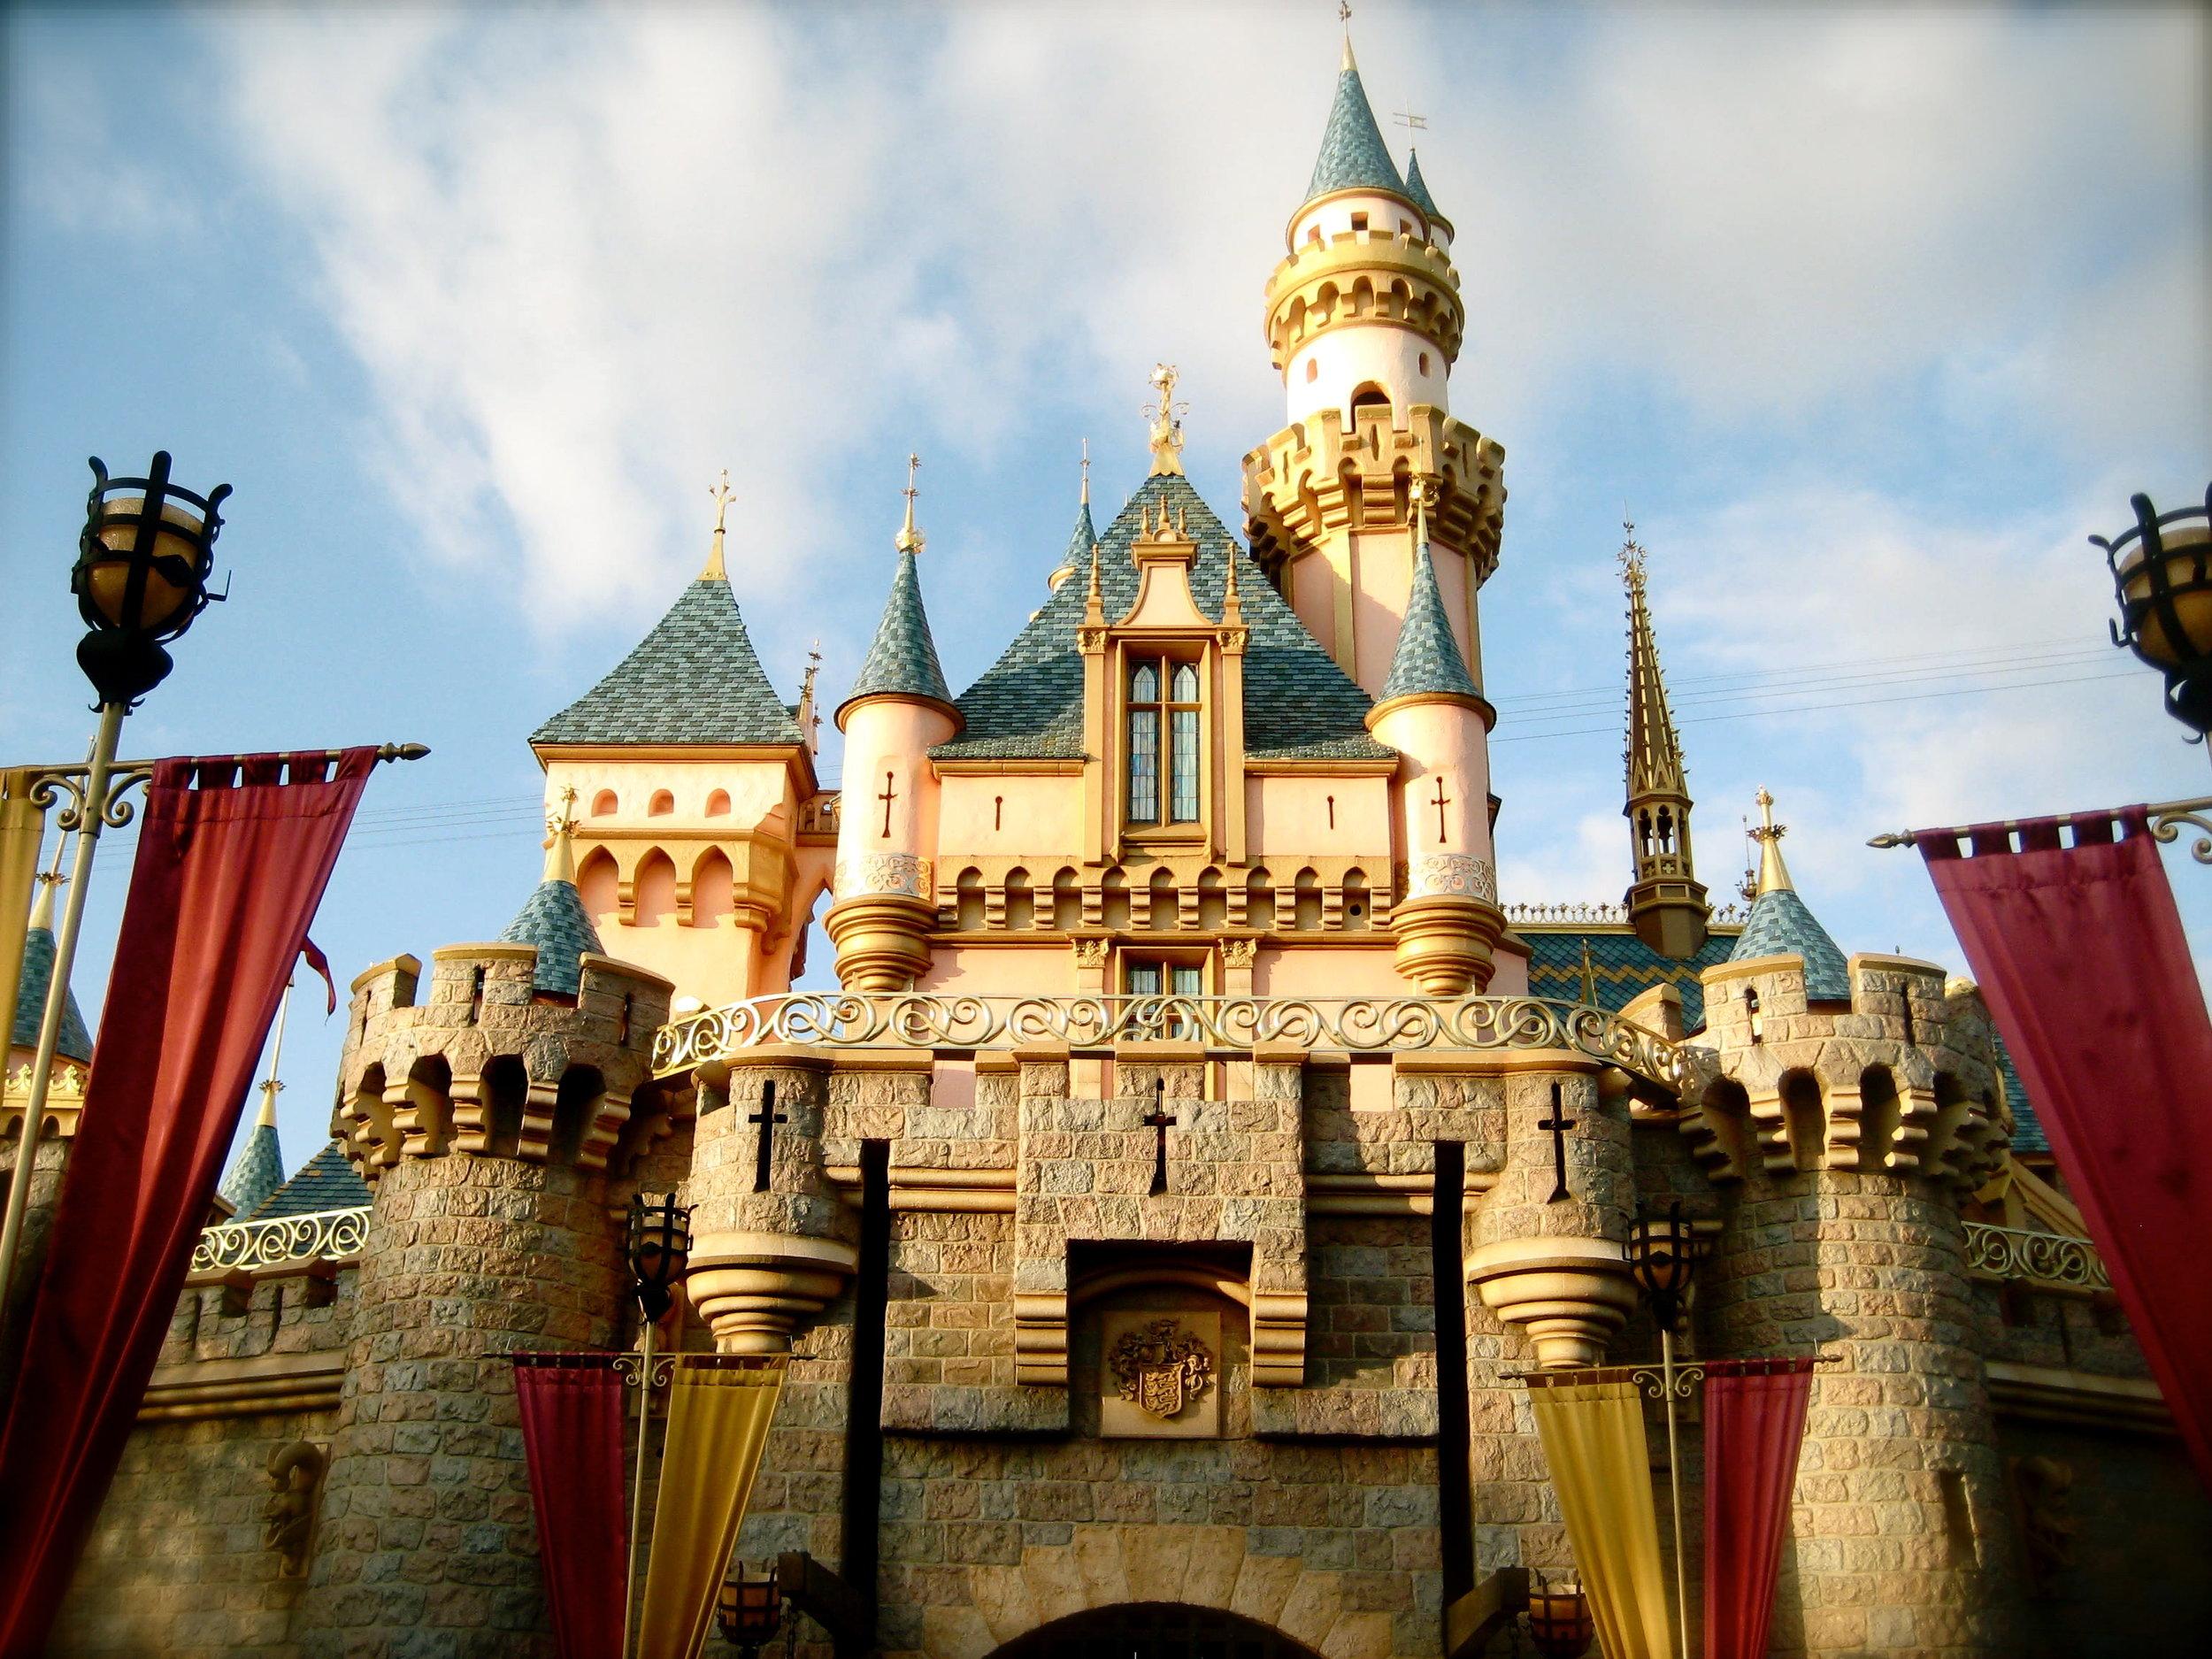 disneyland-sleeping-beauty-castle